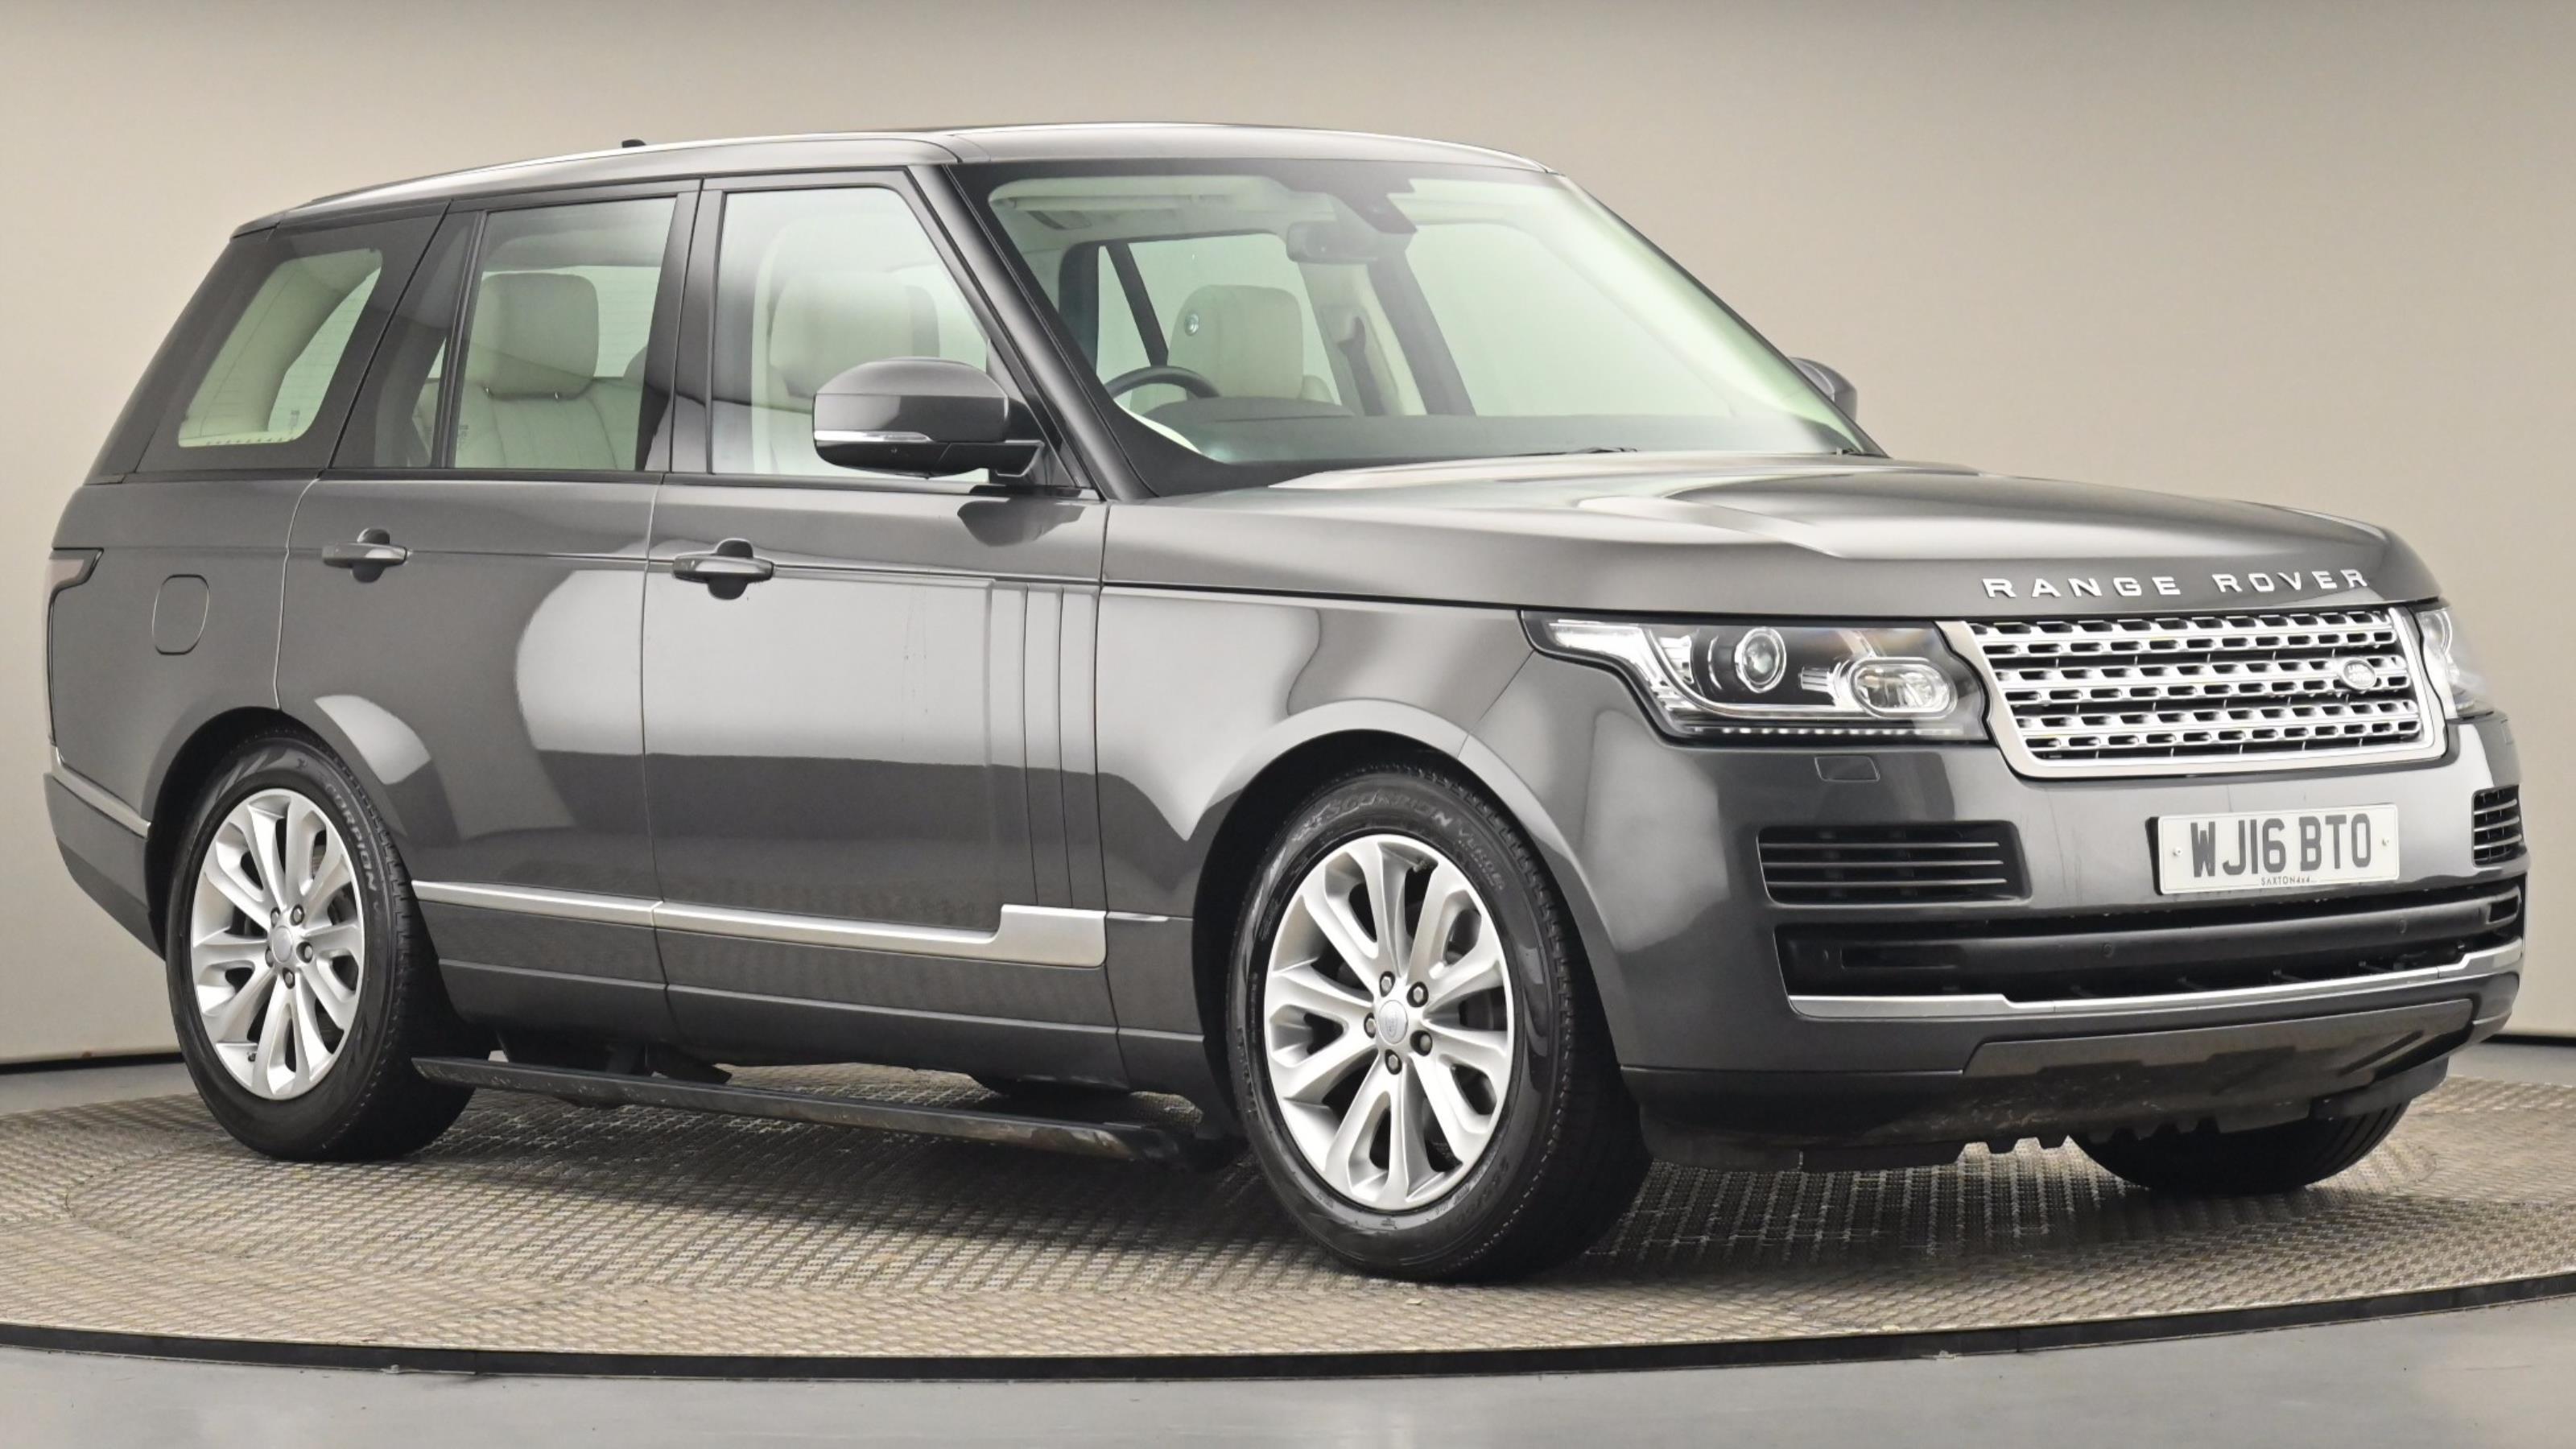 Used 2016 Land Rover RANGE ROVER 3.0 TDV6 Vogue 4dr Auto at Saxton4x4